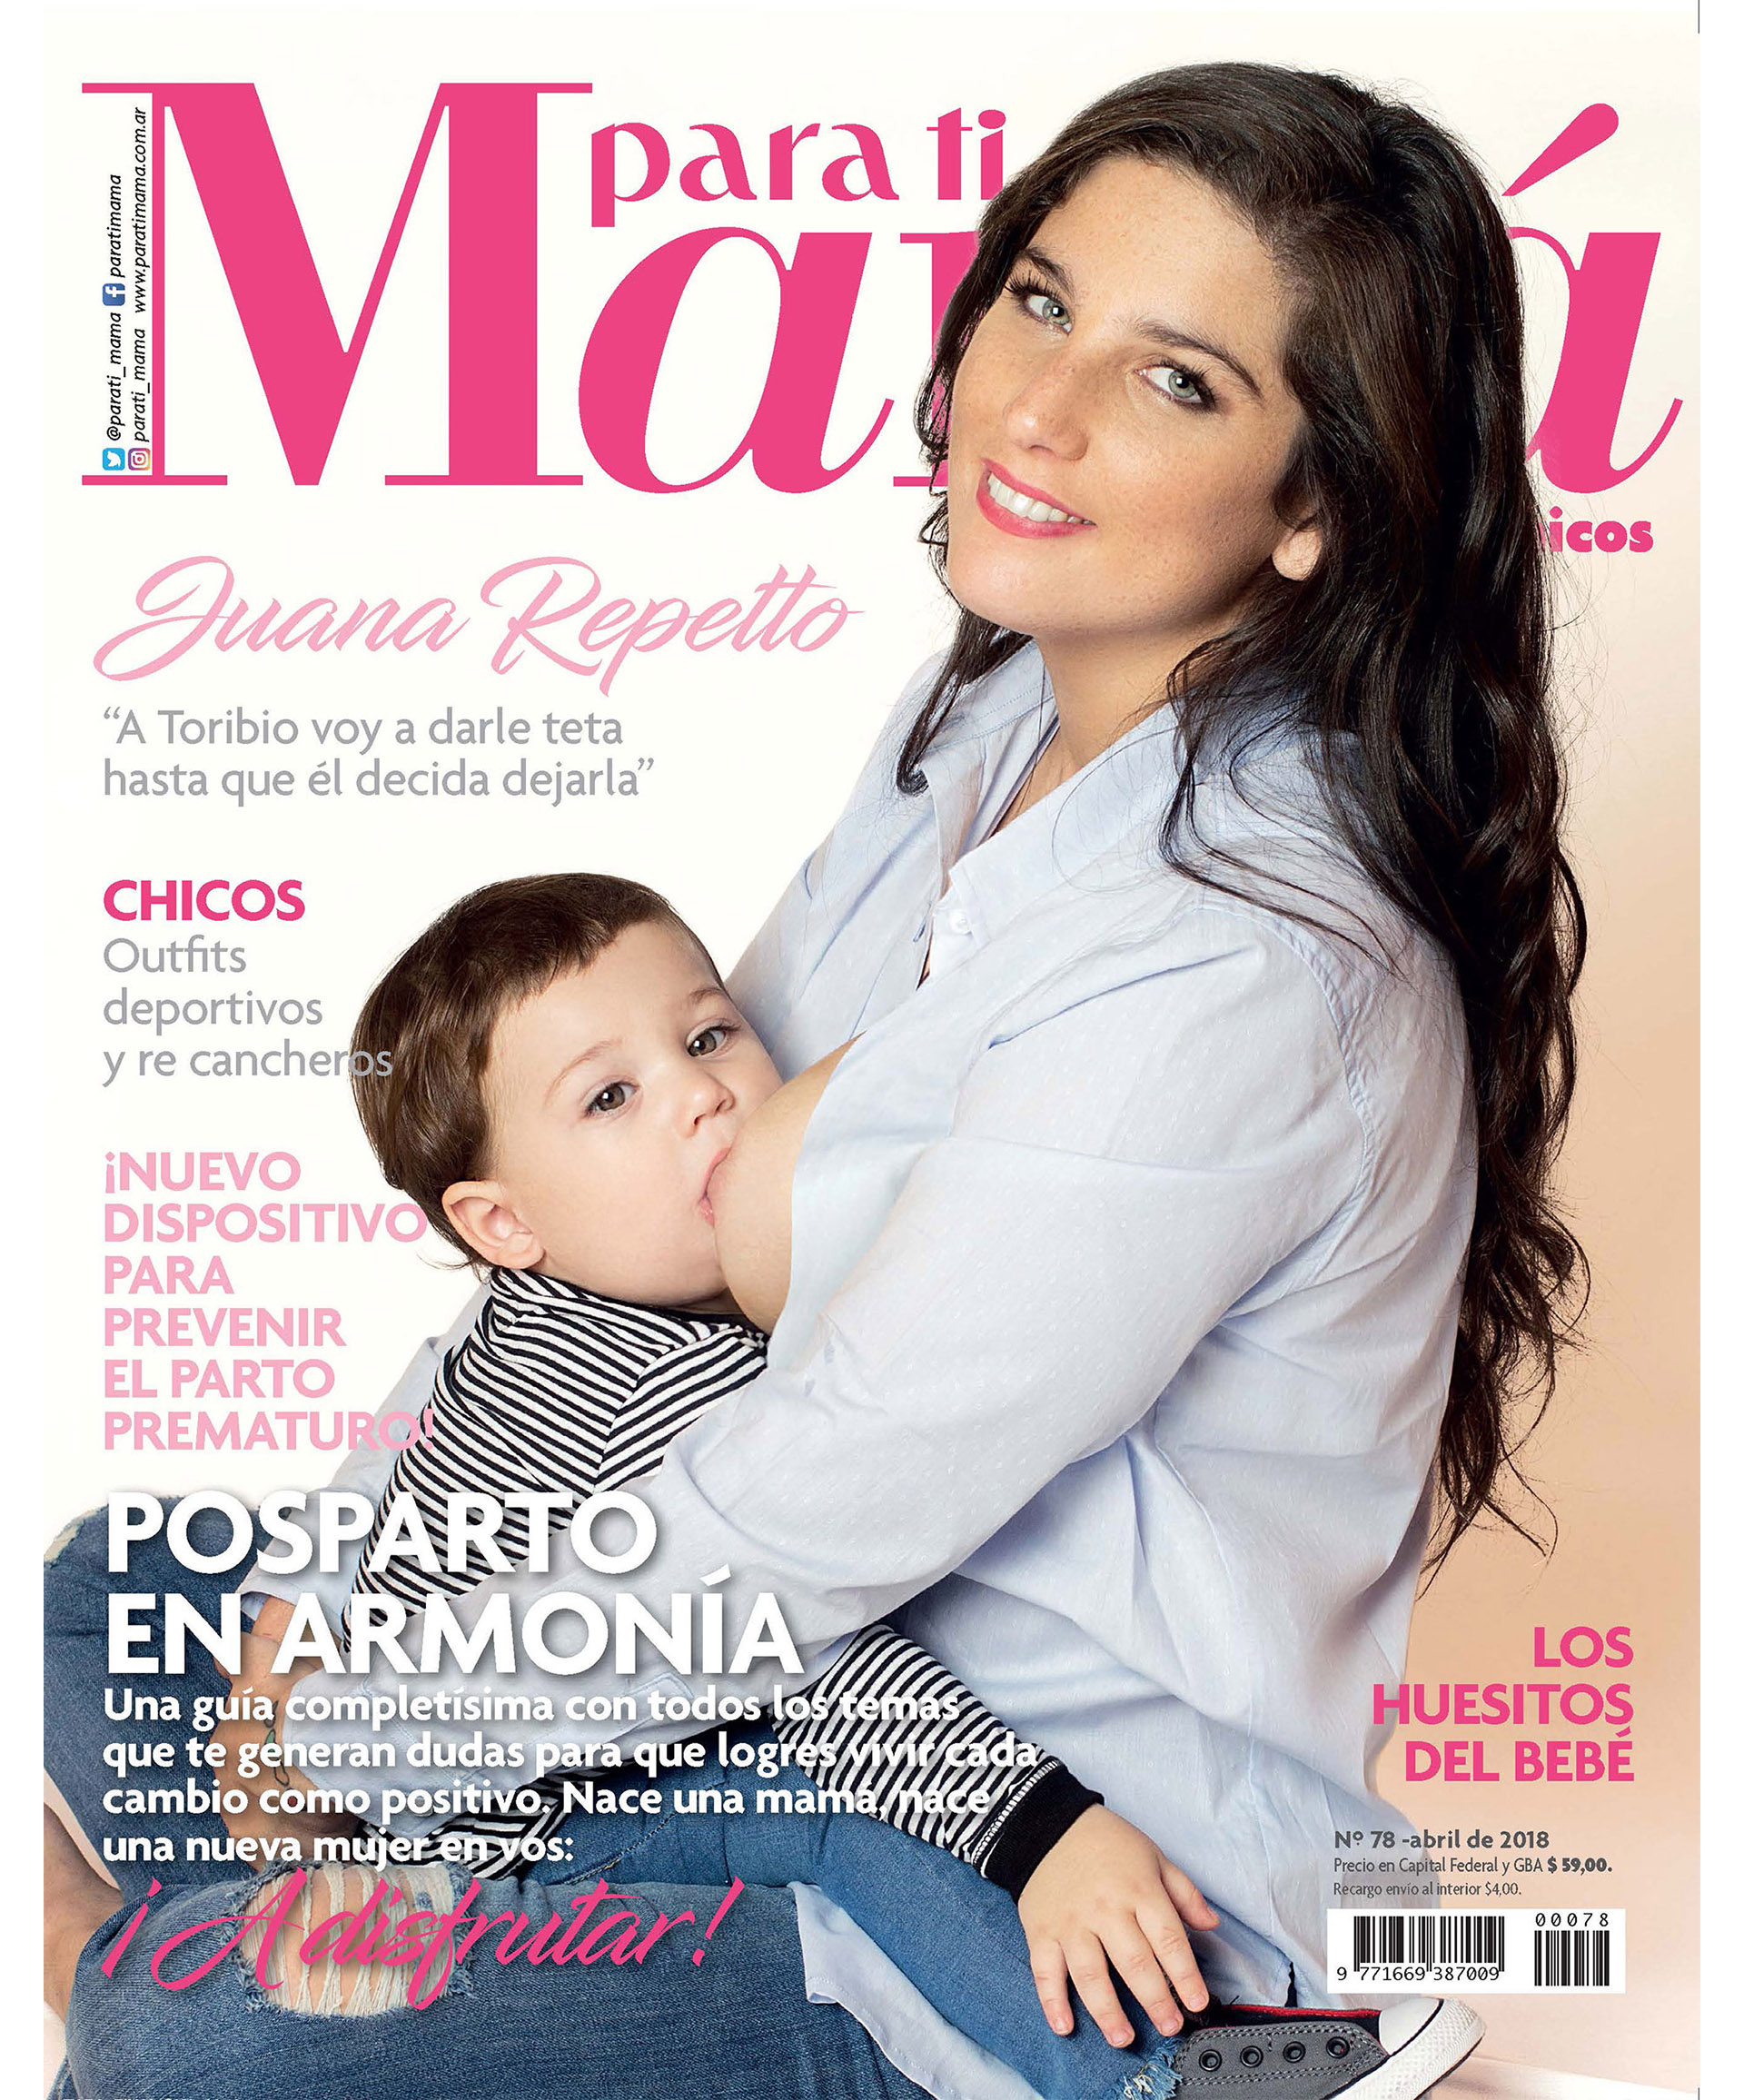 Juana Repetto. Foto: Rosalía Cameroni / Para Ti Mamá.